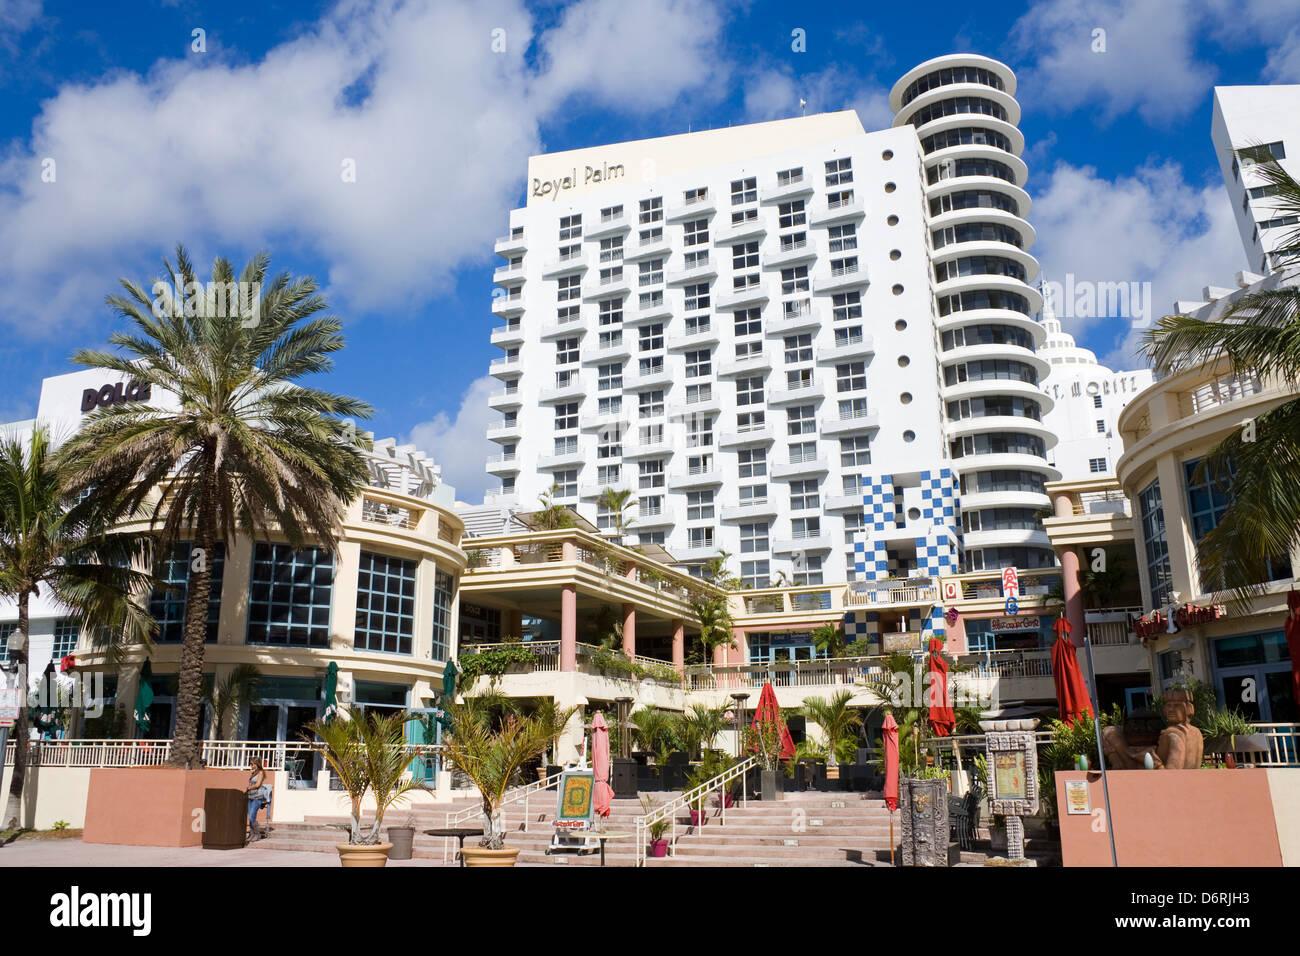 Royal palm hotel on south beach miami beach florida usa